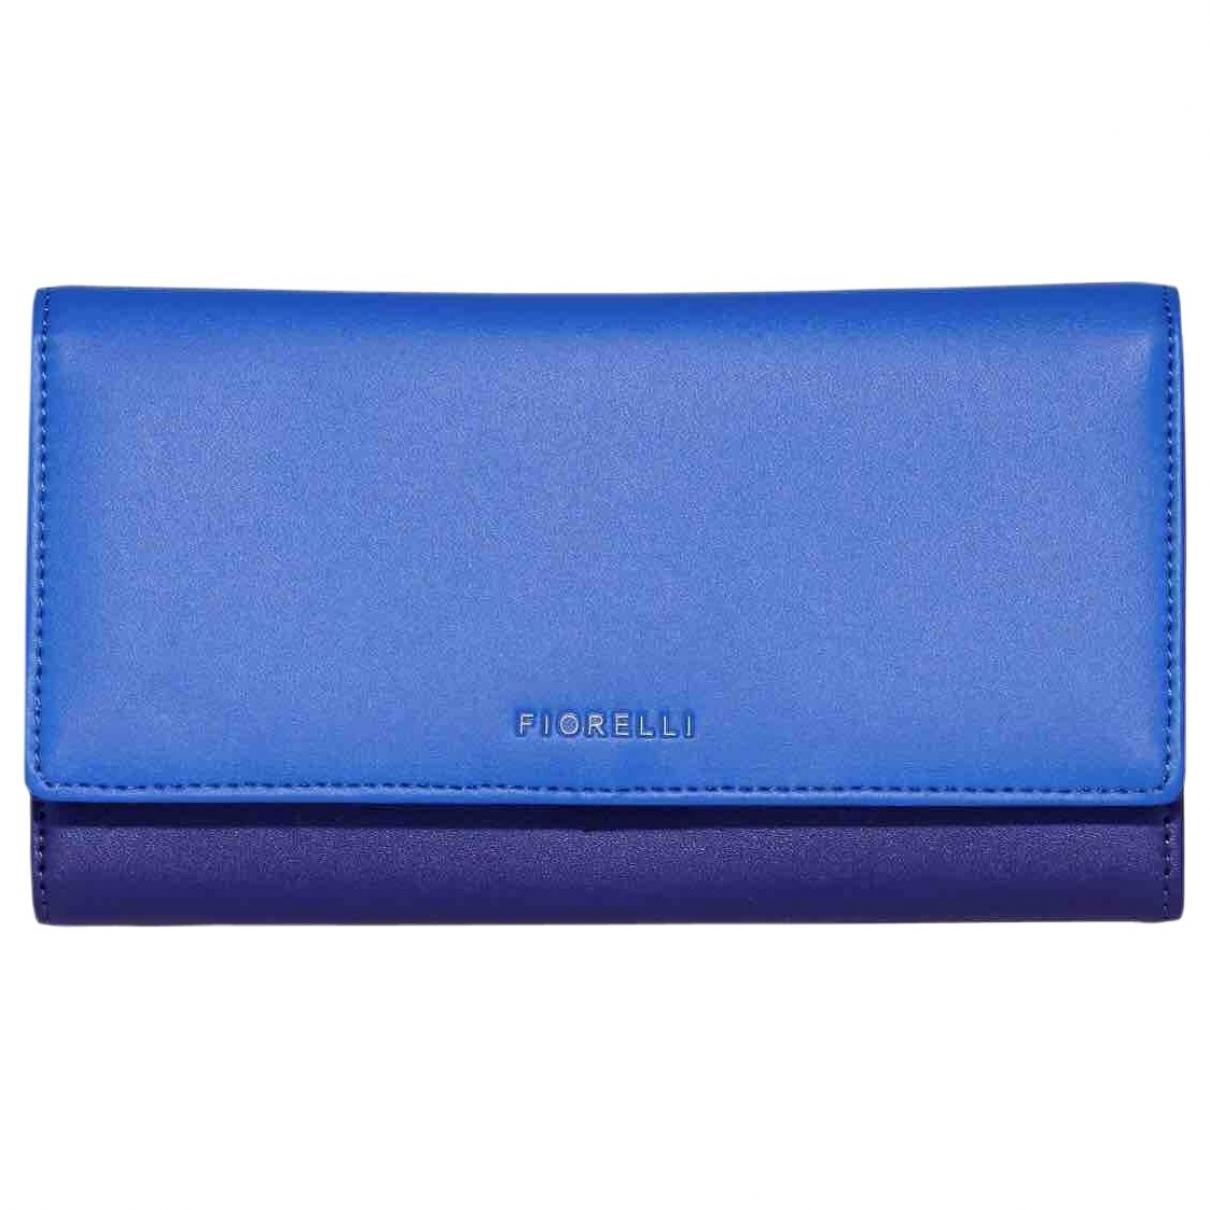 Fiorucci \N Portemonnaie in  Blau Leder